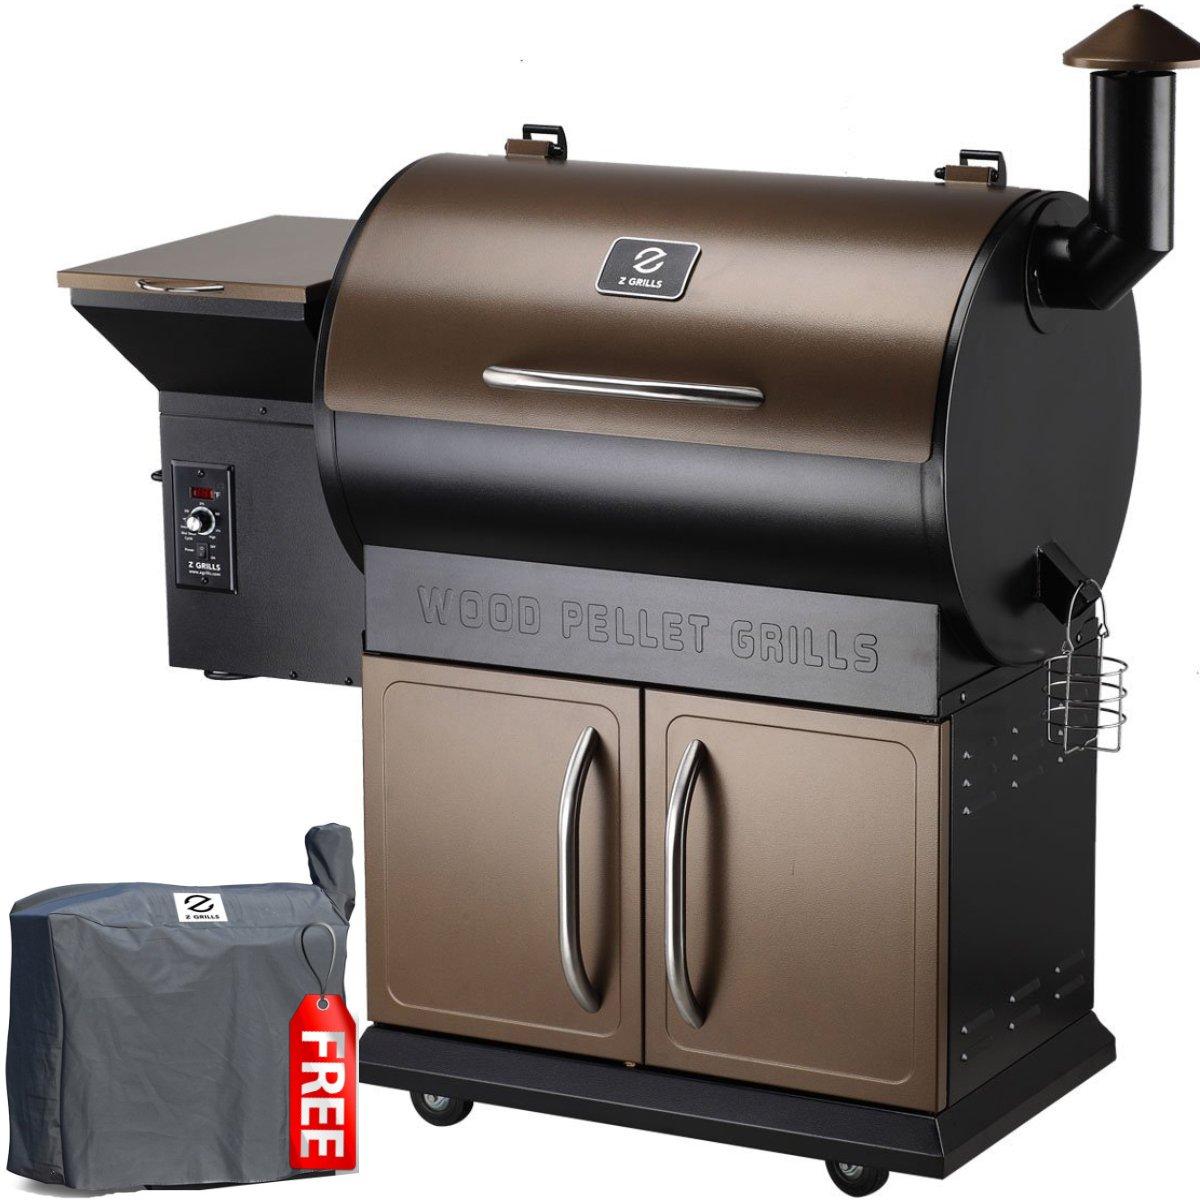 Z GRILLS ZPG-700C Wood Pellet Grill & Smoker, 700 sq. in. Bronze/Black